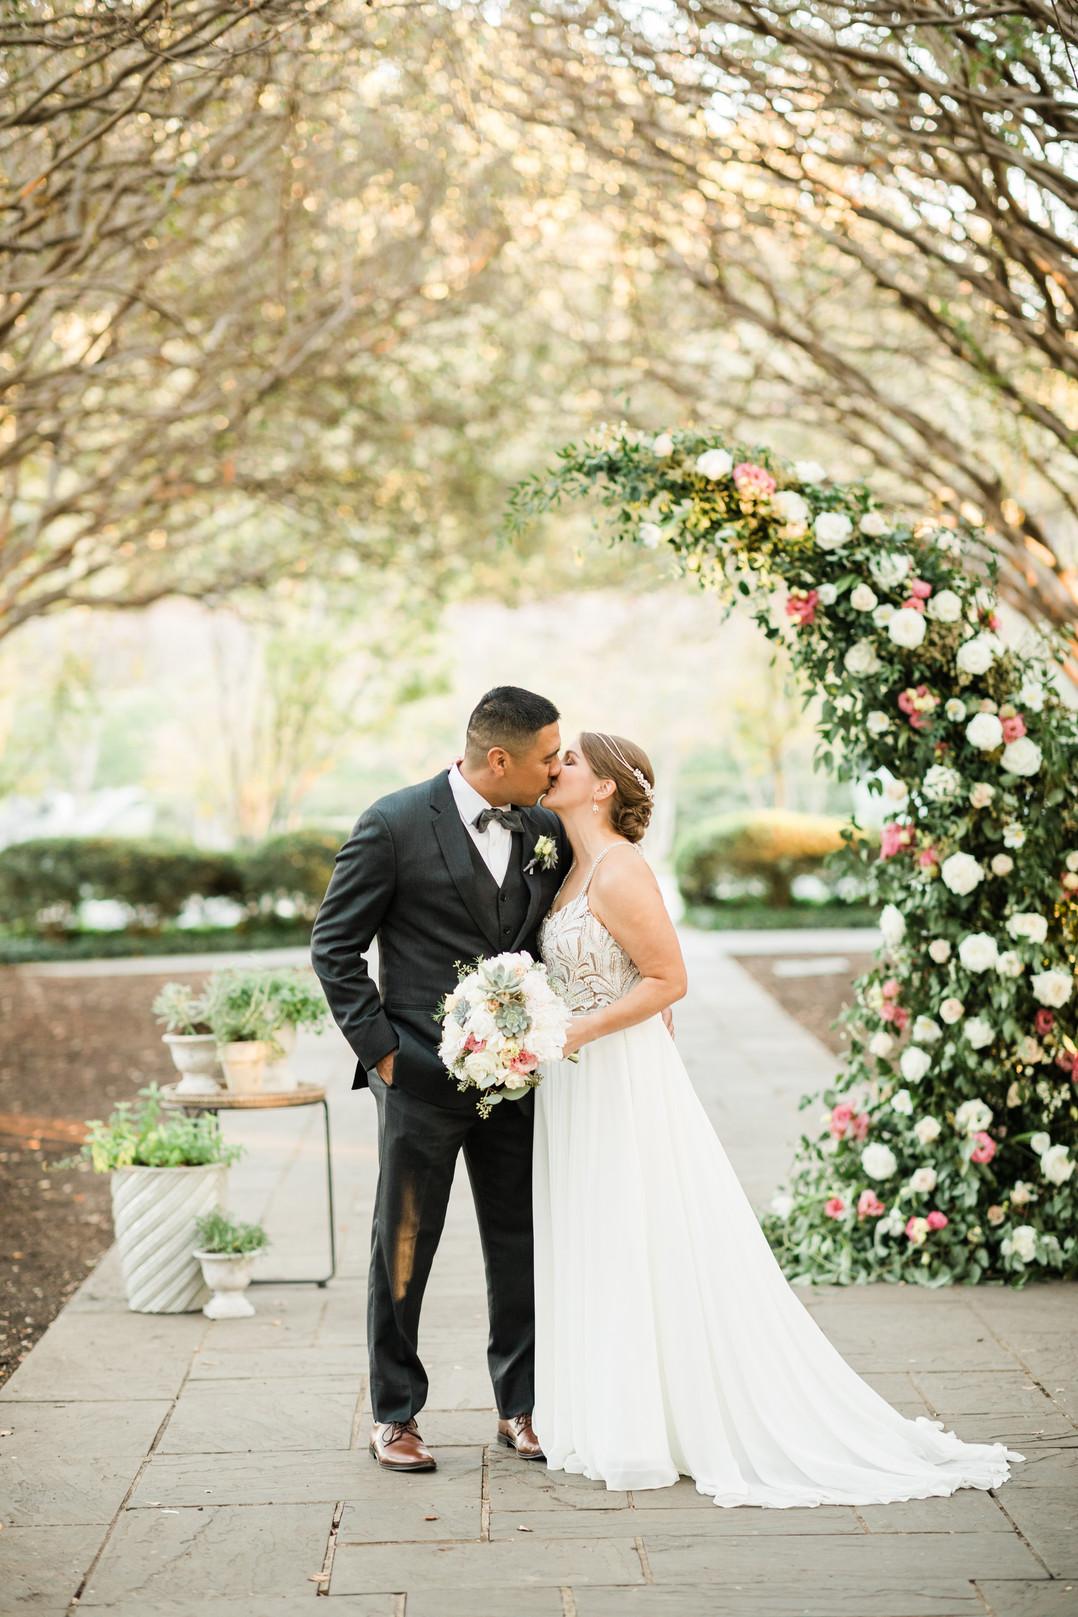 Lizzie & Gil | The Dallas Arboretum | Micro Wedding Ceremony